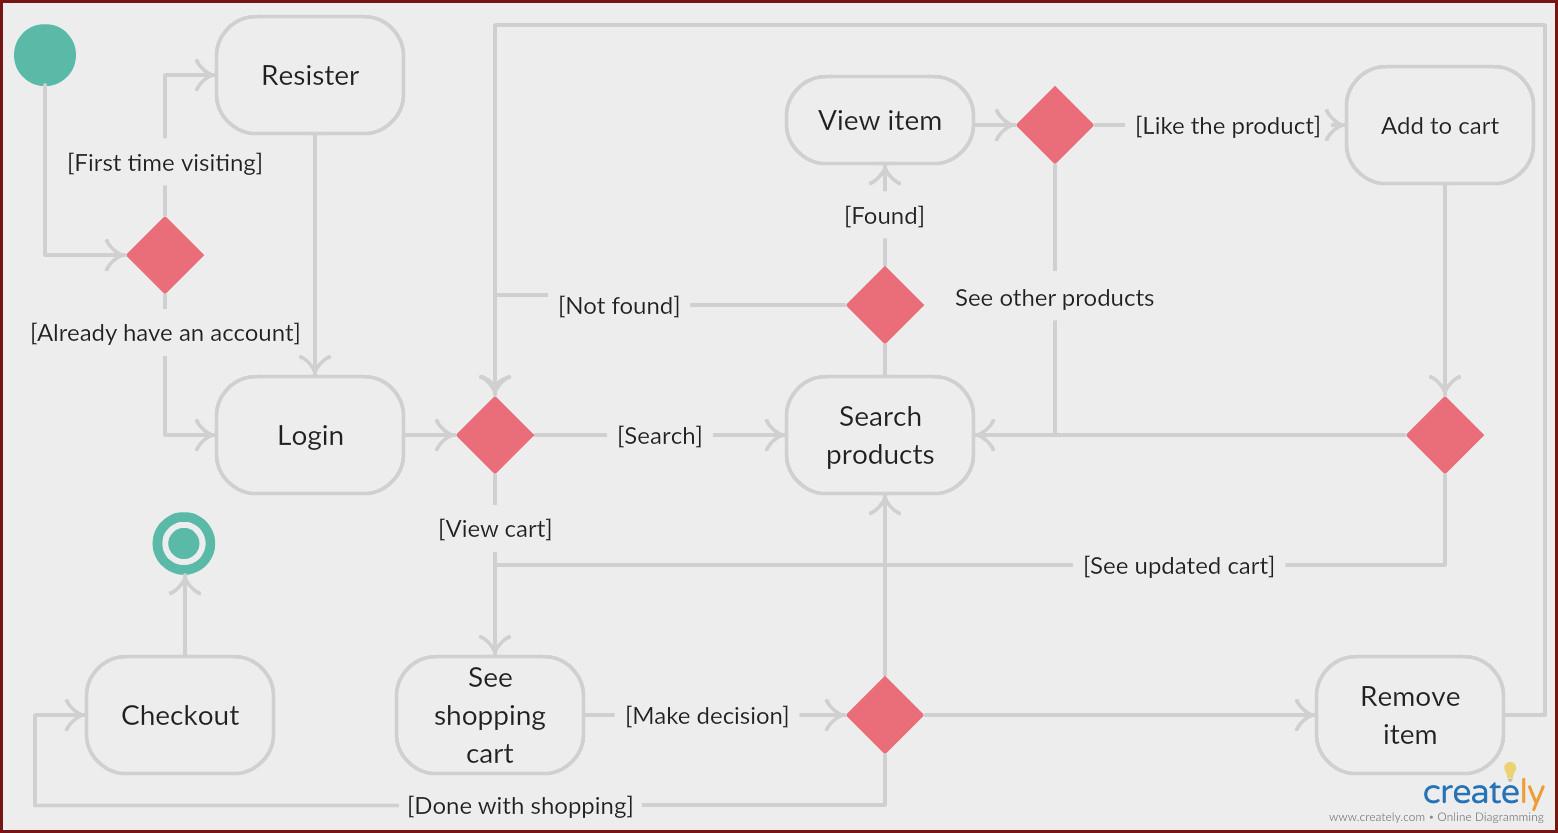 Create Erd Diagram In Visio At Manuals Library with regard to Erd Диаграмма